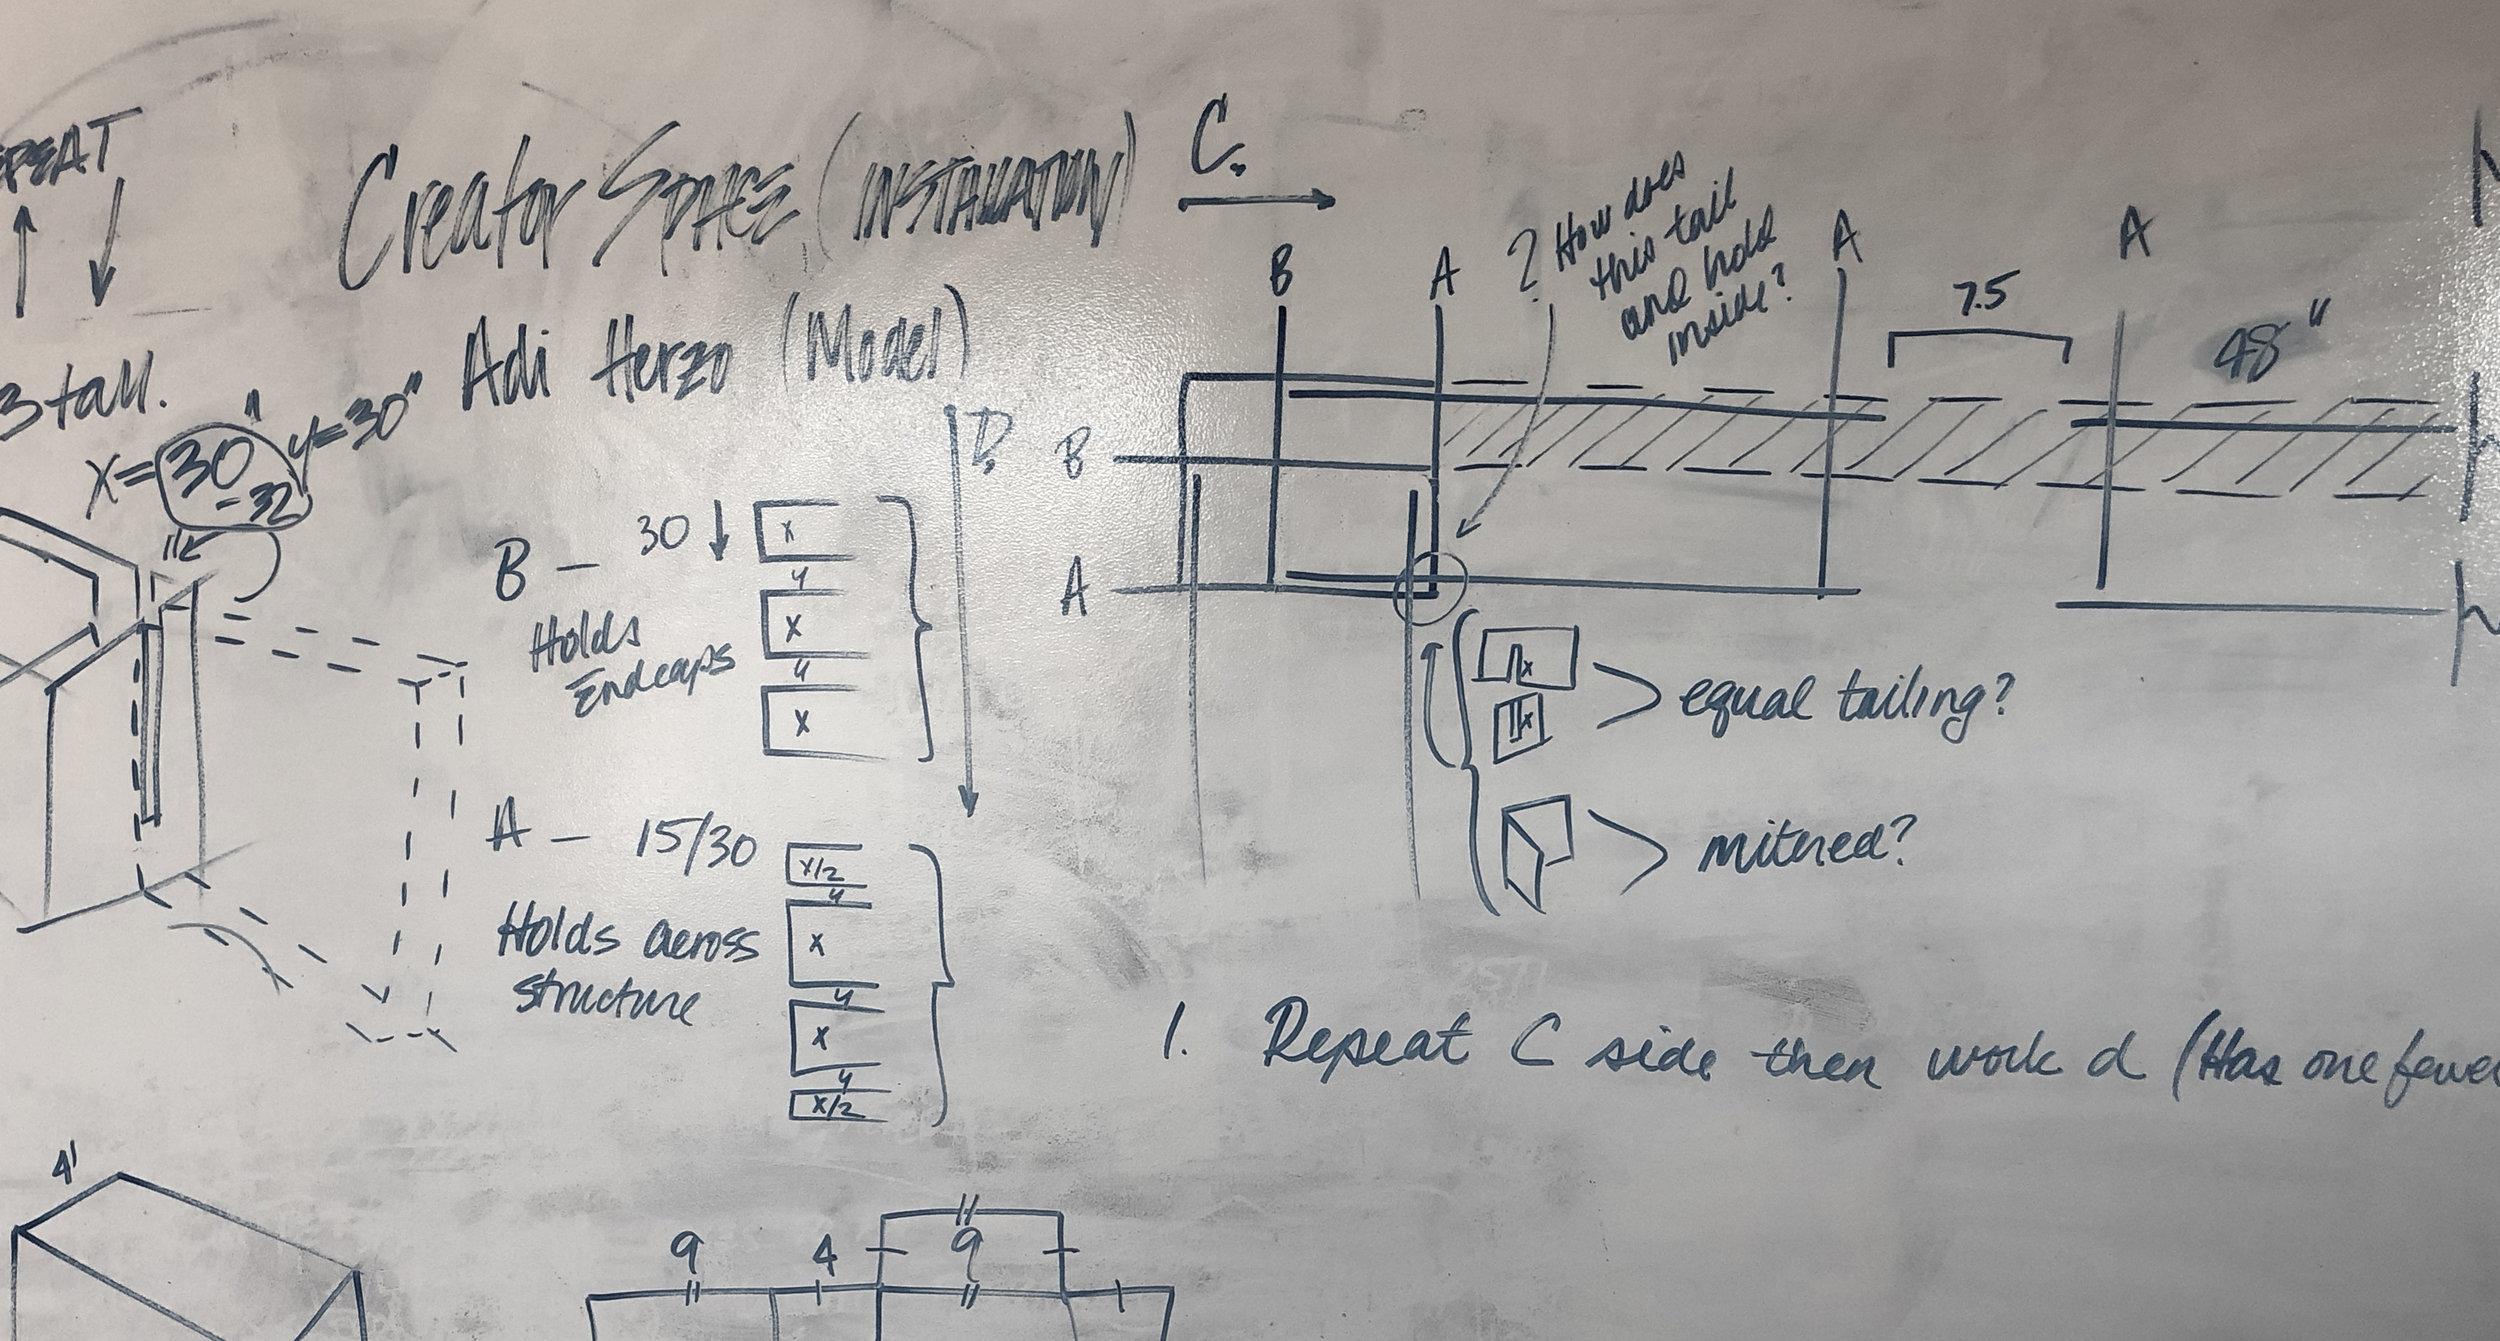 Adi_CreatorSpace_MG_Whiteboard.jpg